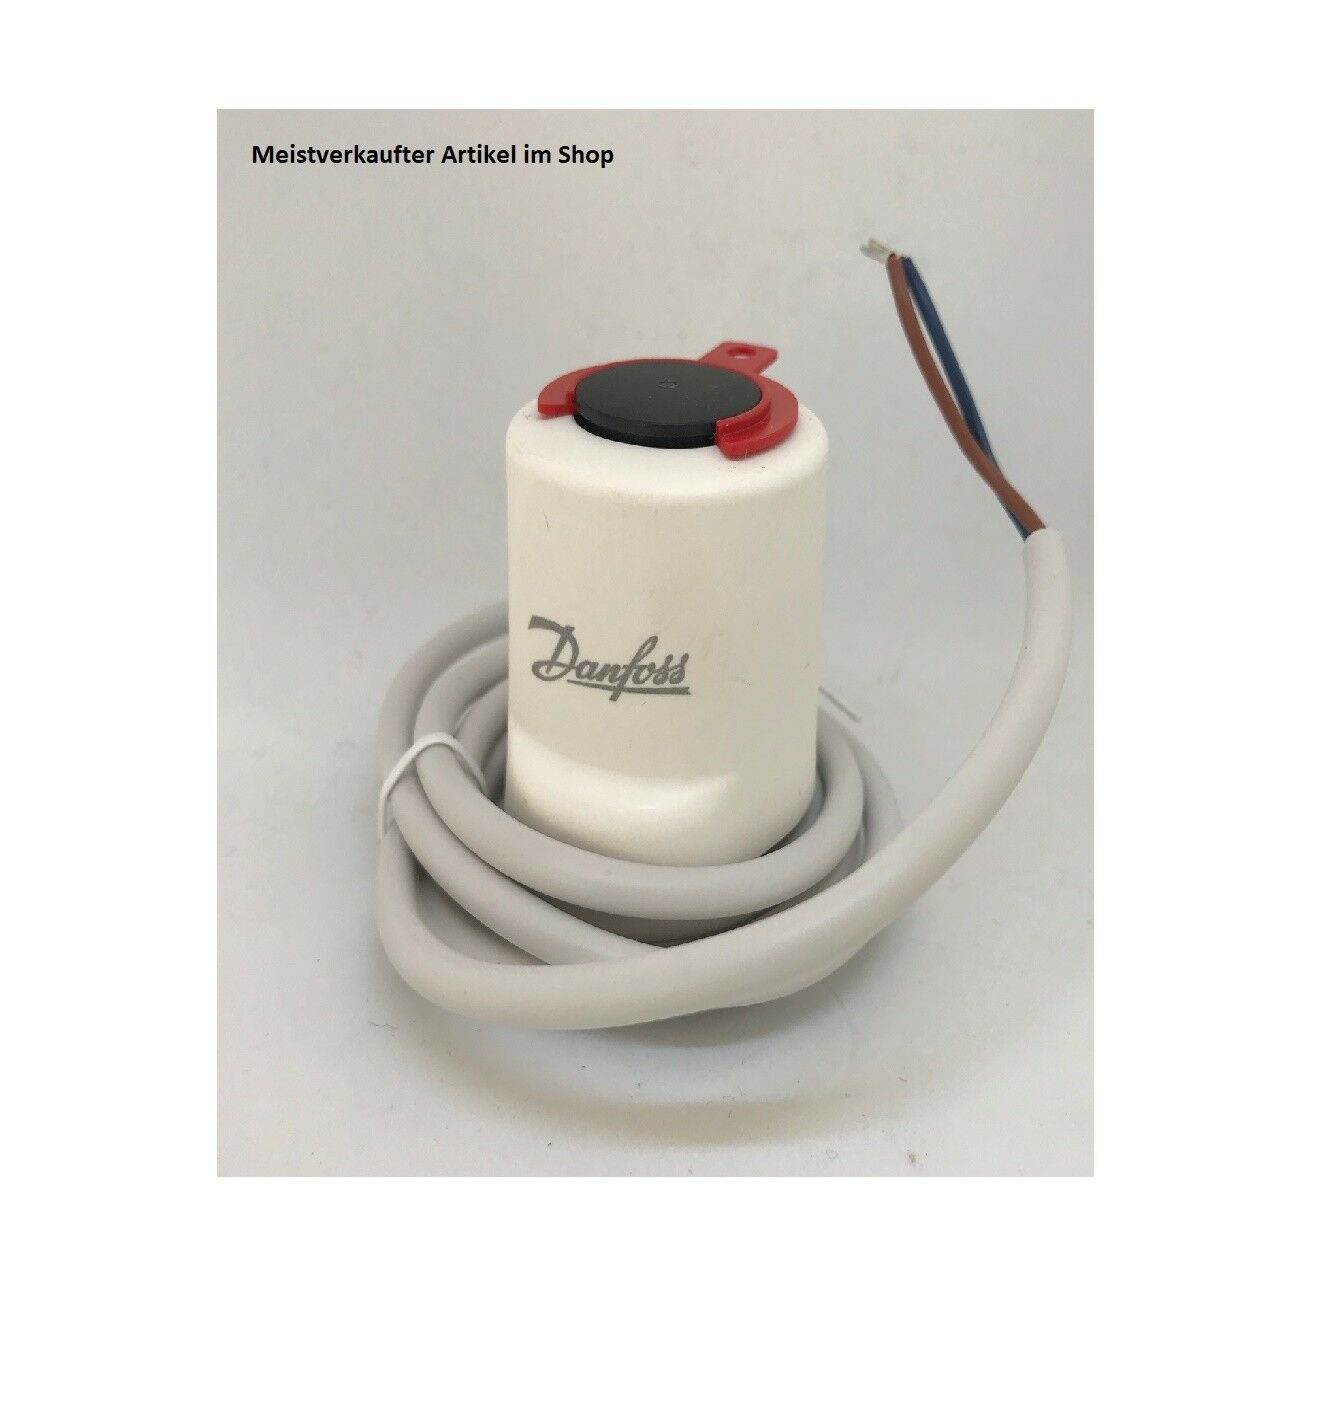 Danfoss Thermot Stellantrieb Fußbodenheizung 230V 088H3220 Stellmotor